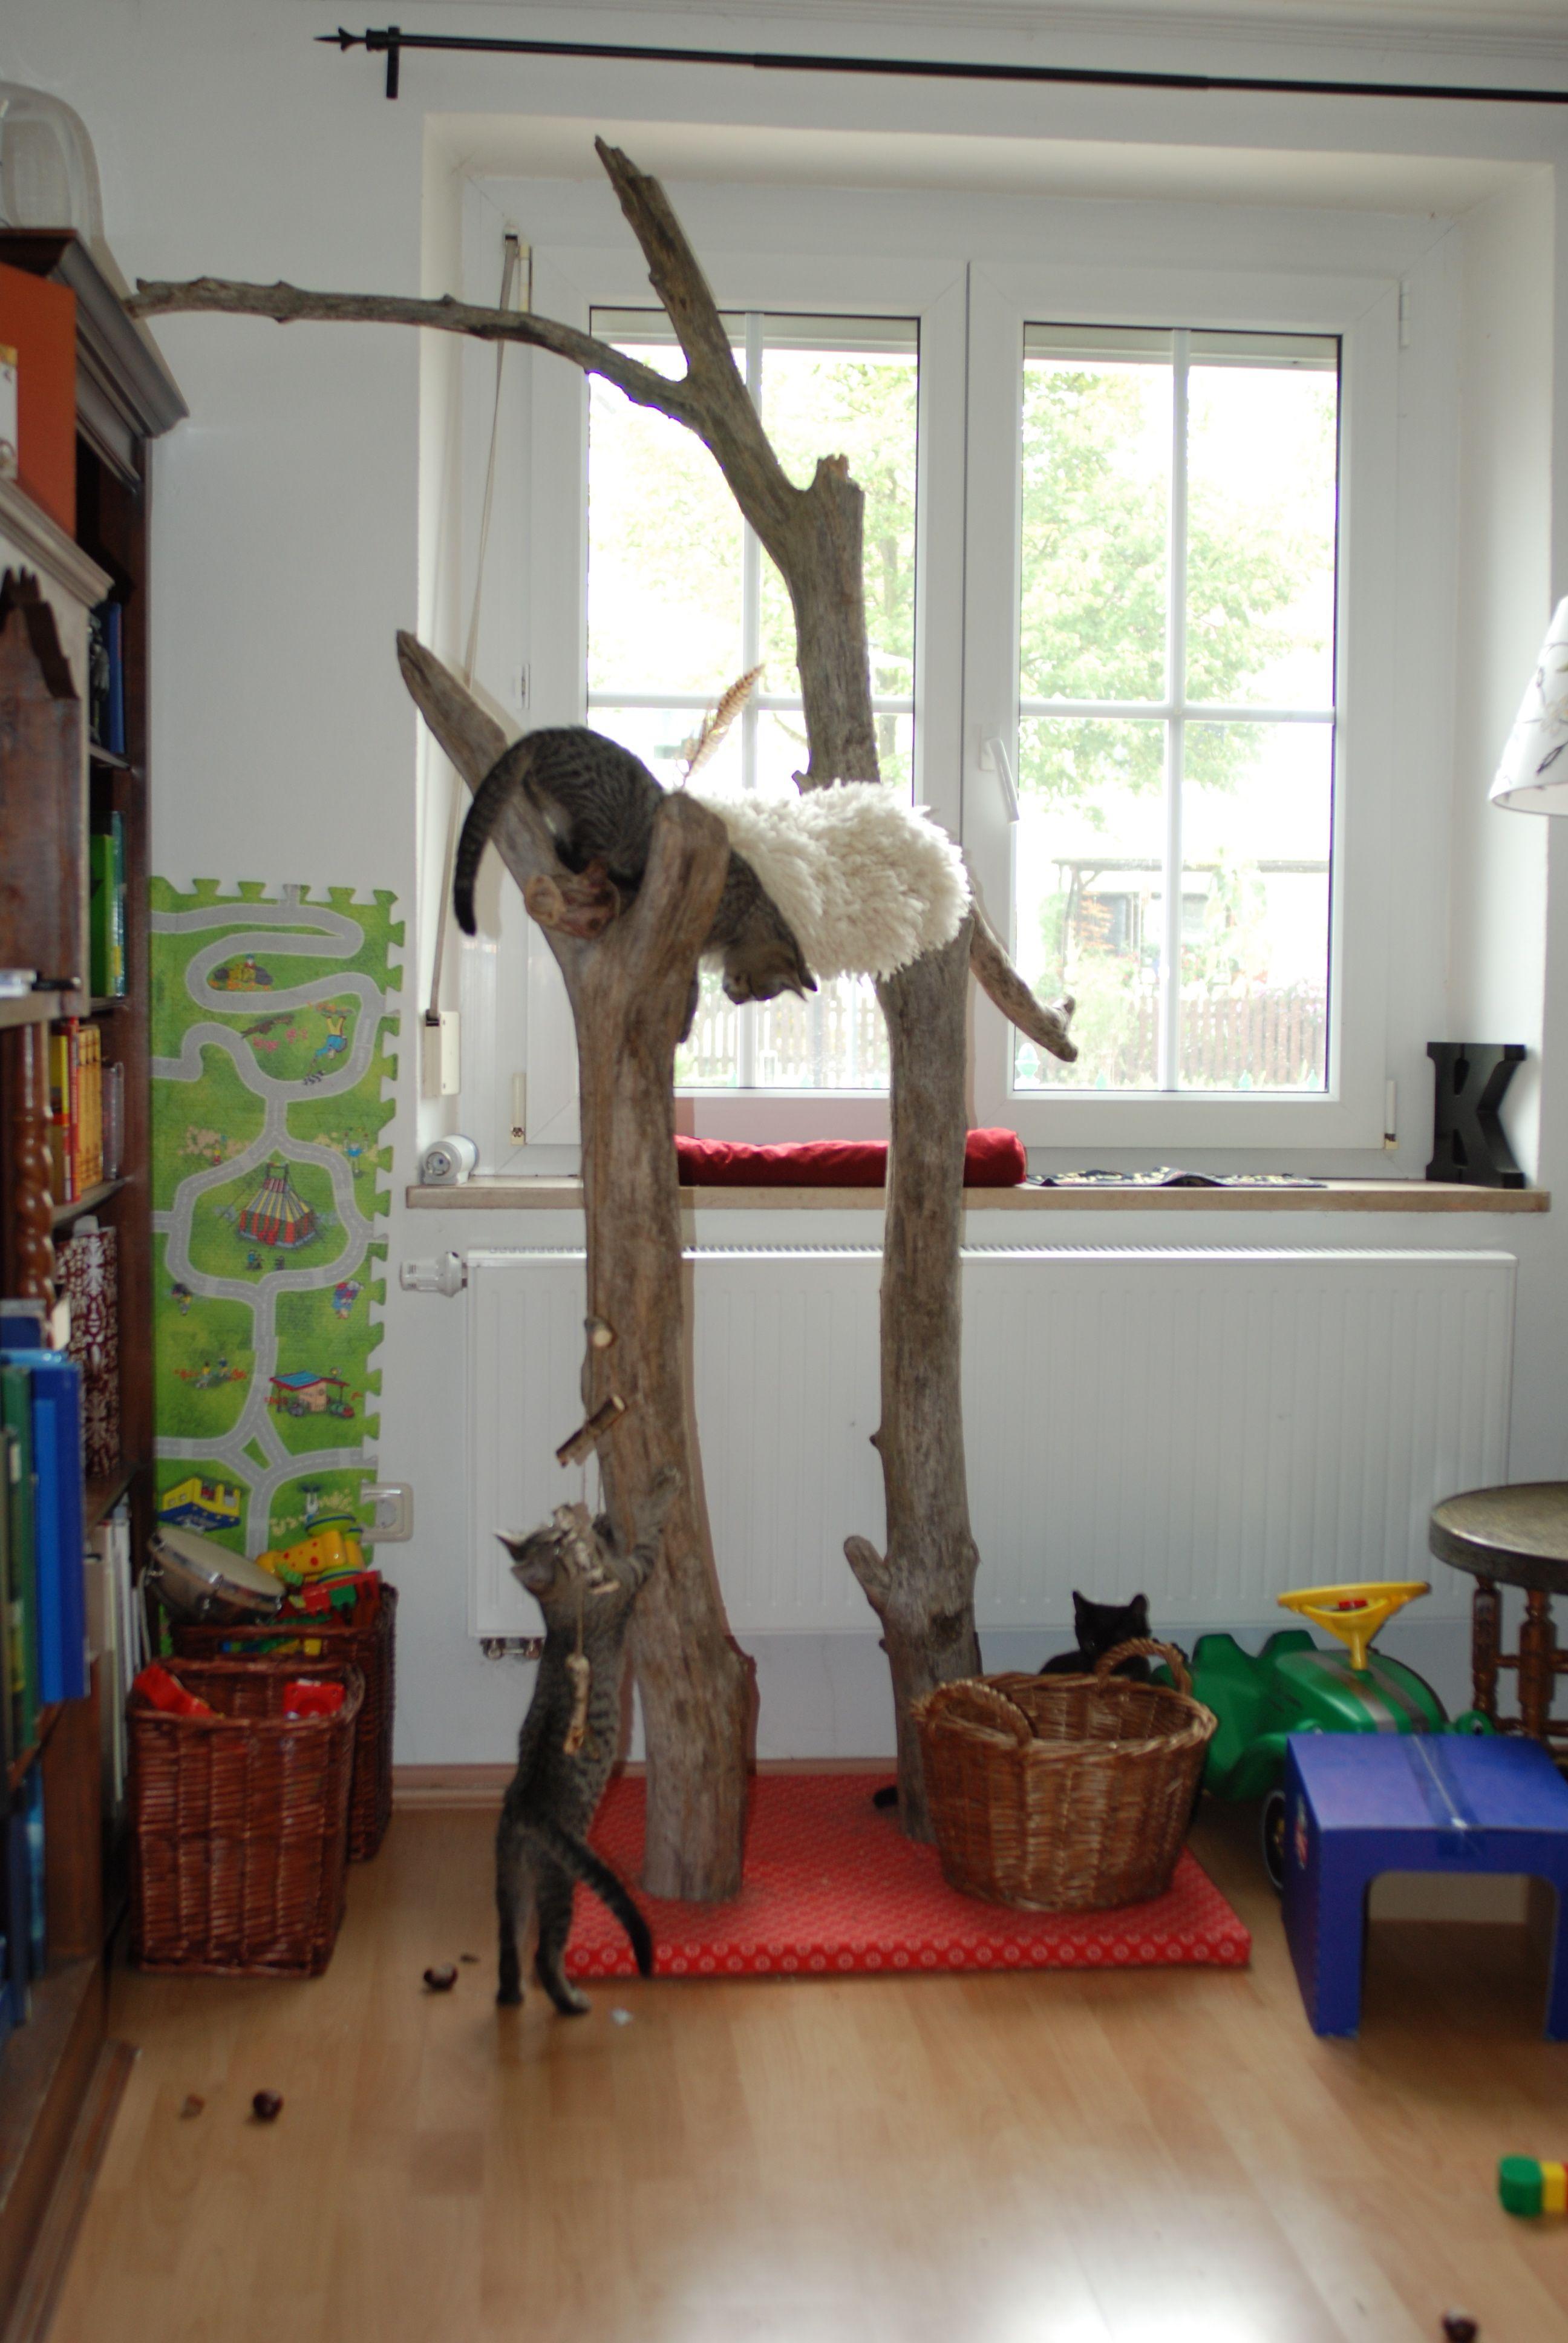 cats scratcher done katzenkratzbaum aus altem. Black Bedroom Furniture Sets. Home Design Ideas